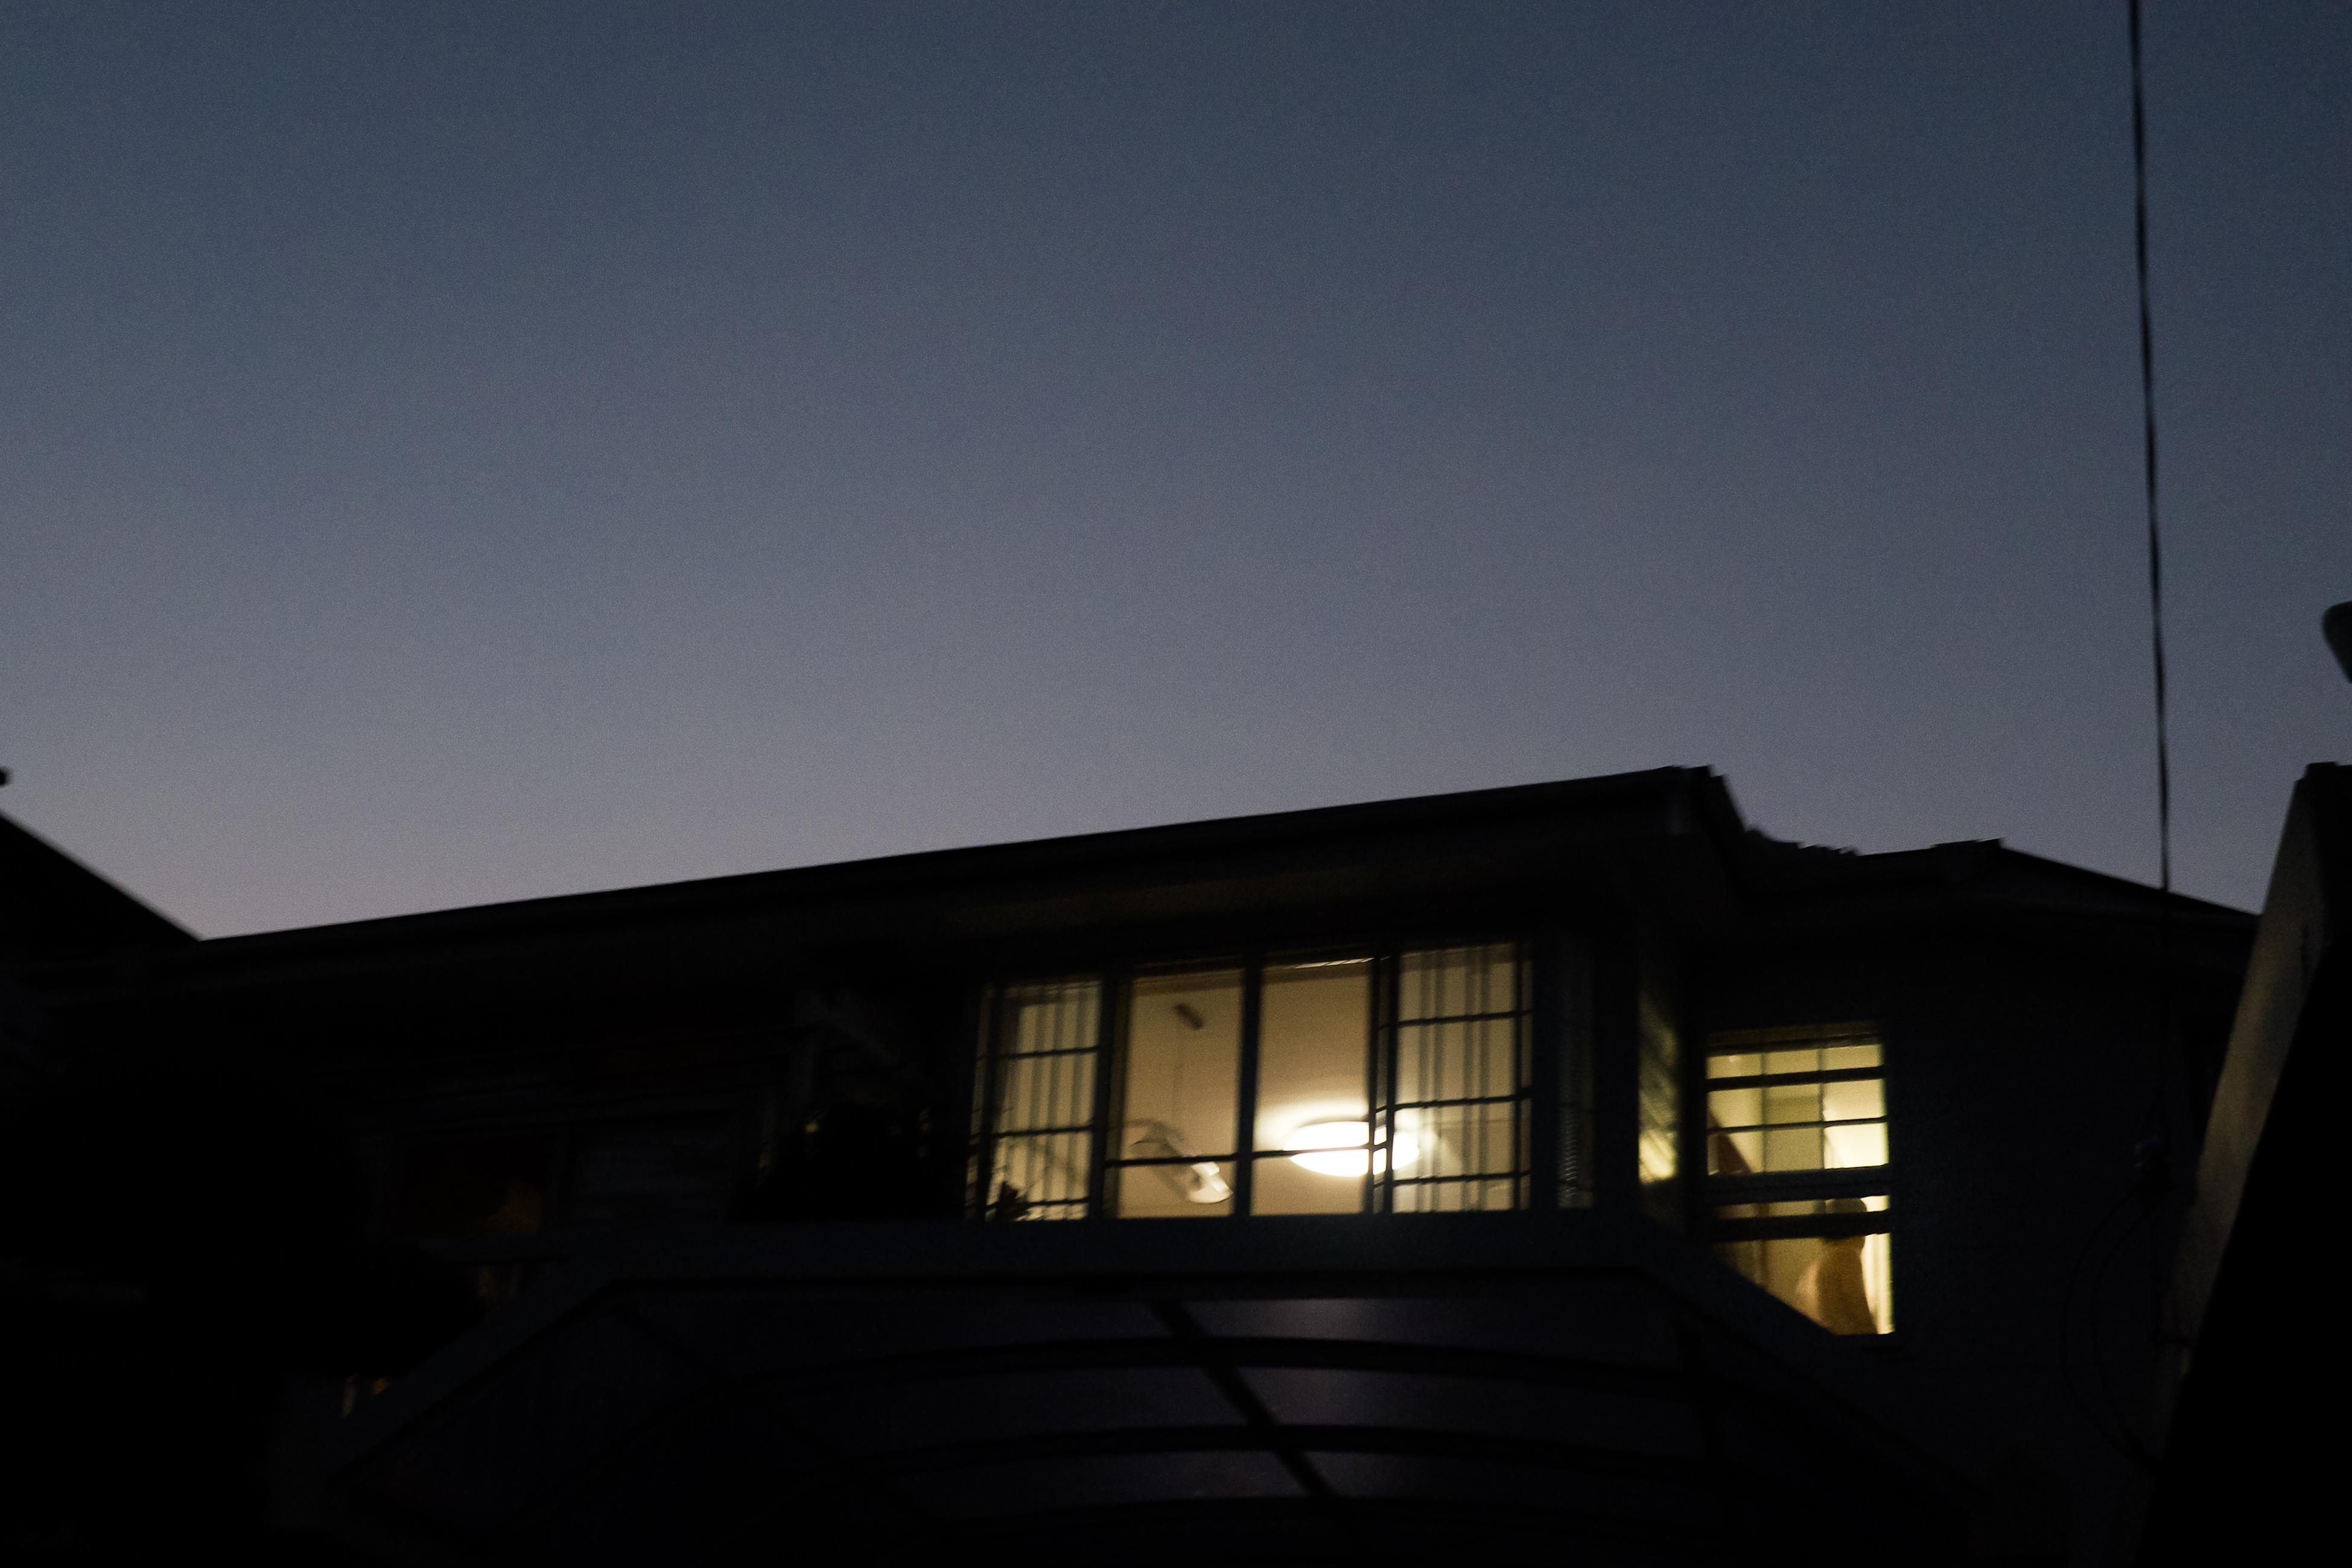 MoonlessMoonlitNight-11